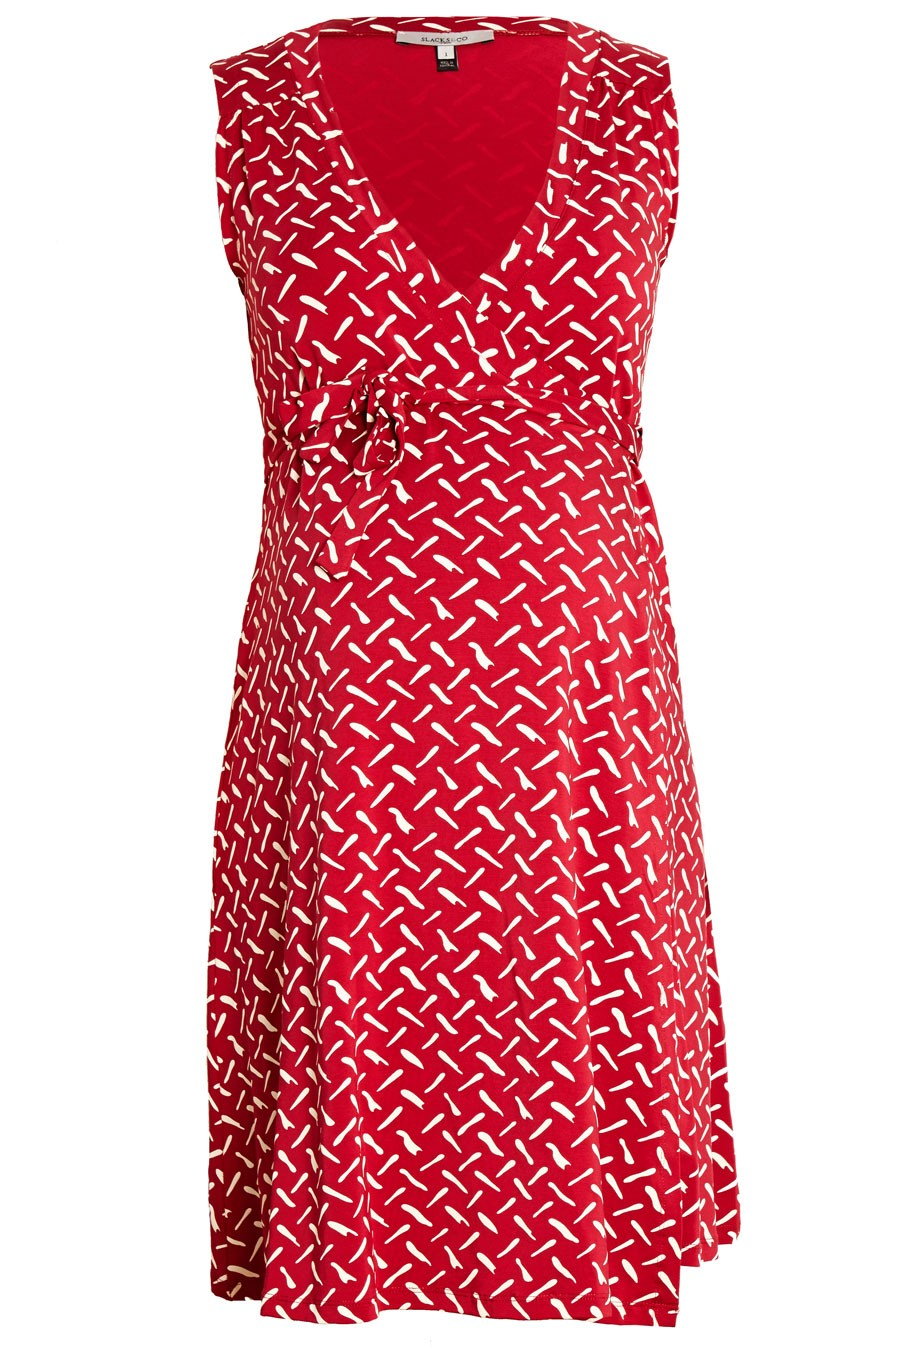 CHLOE Wrap Dress